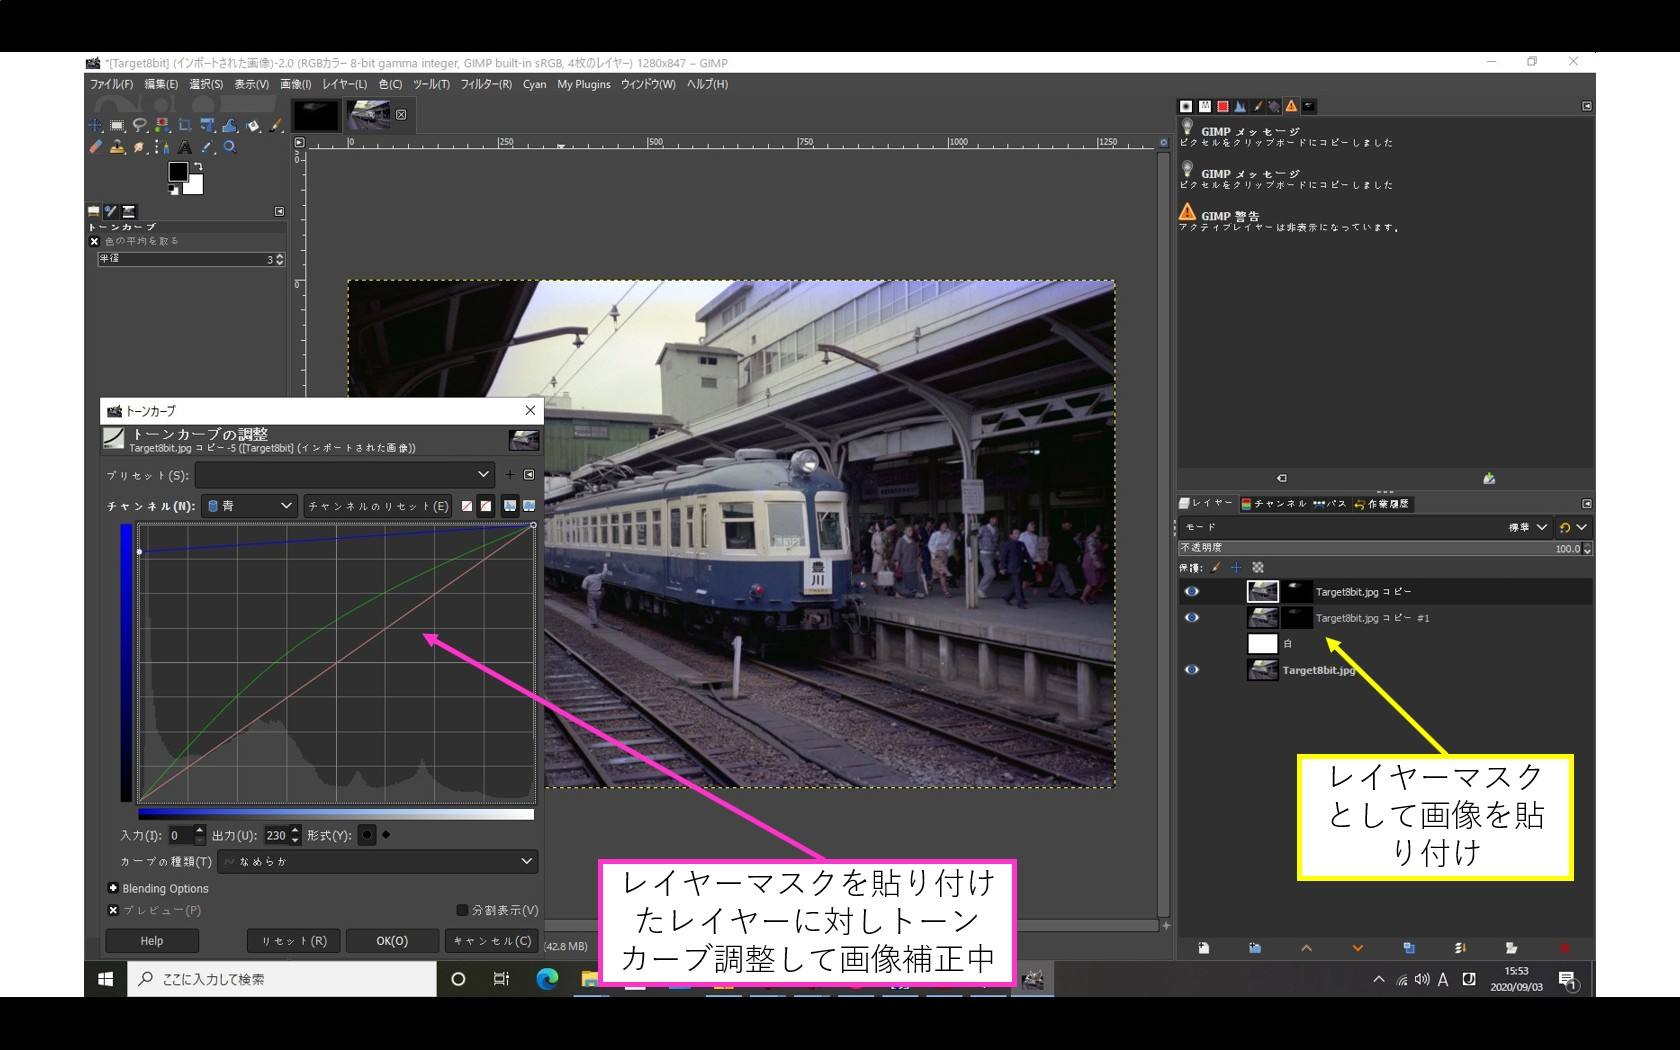 f:id:yasuo_ssi:20200903172235j:plain